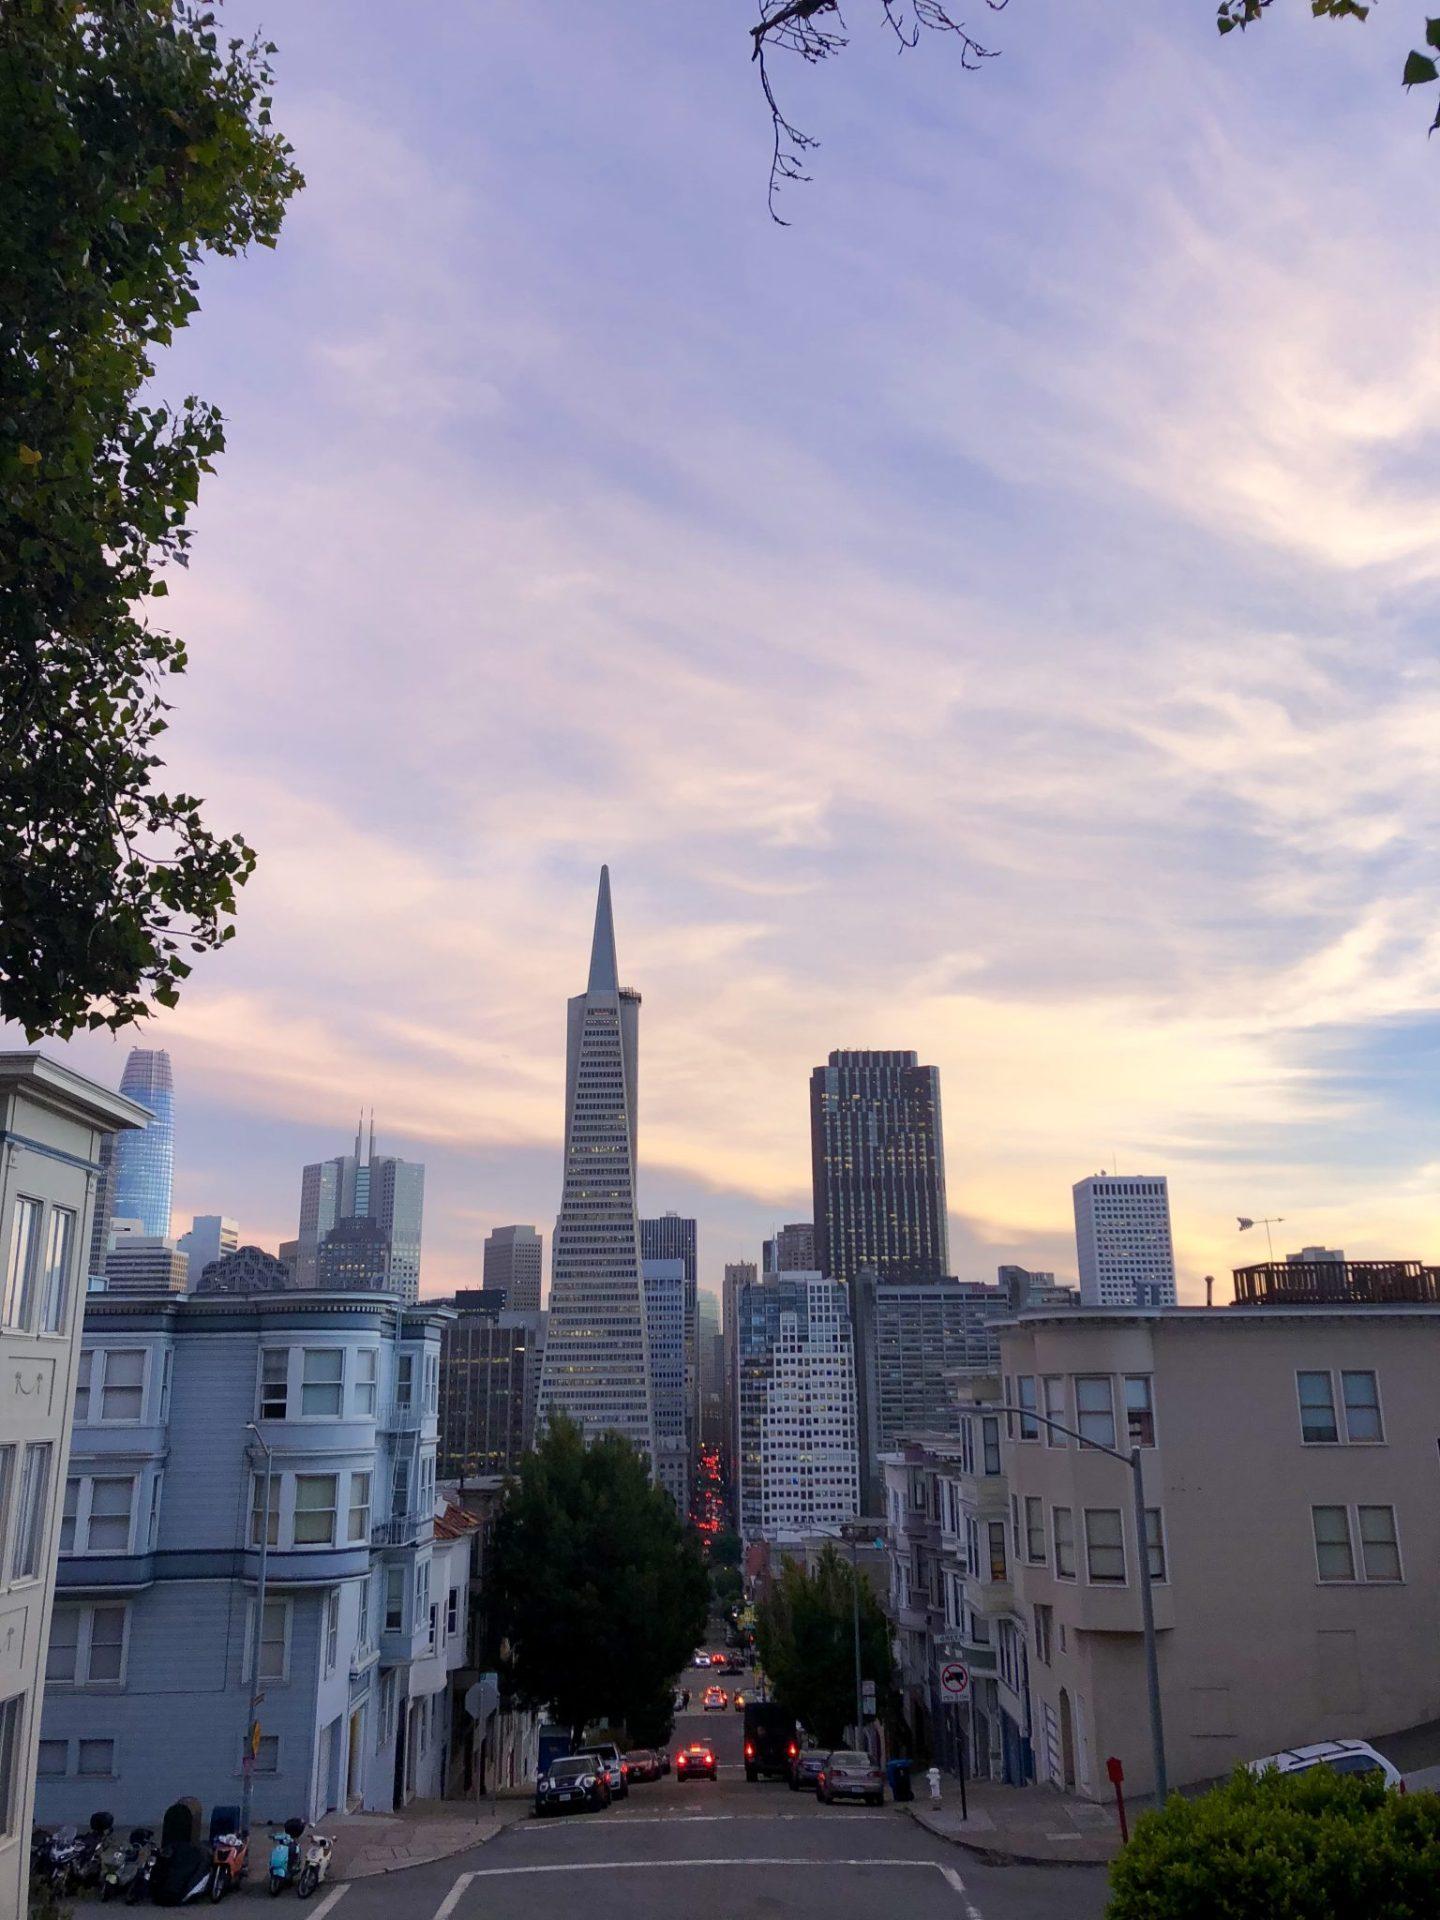 San Francisco: What I Did in a Week